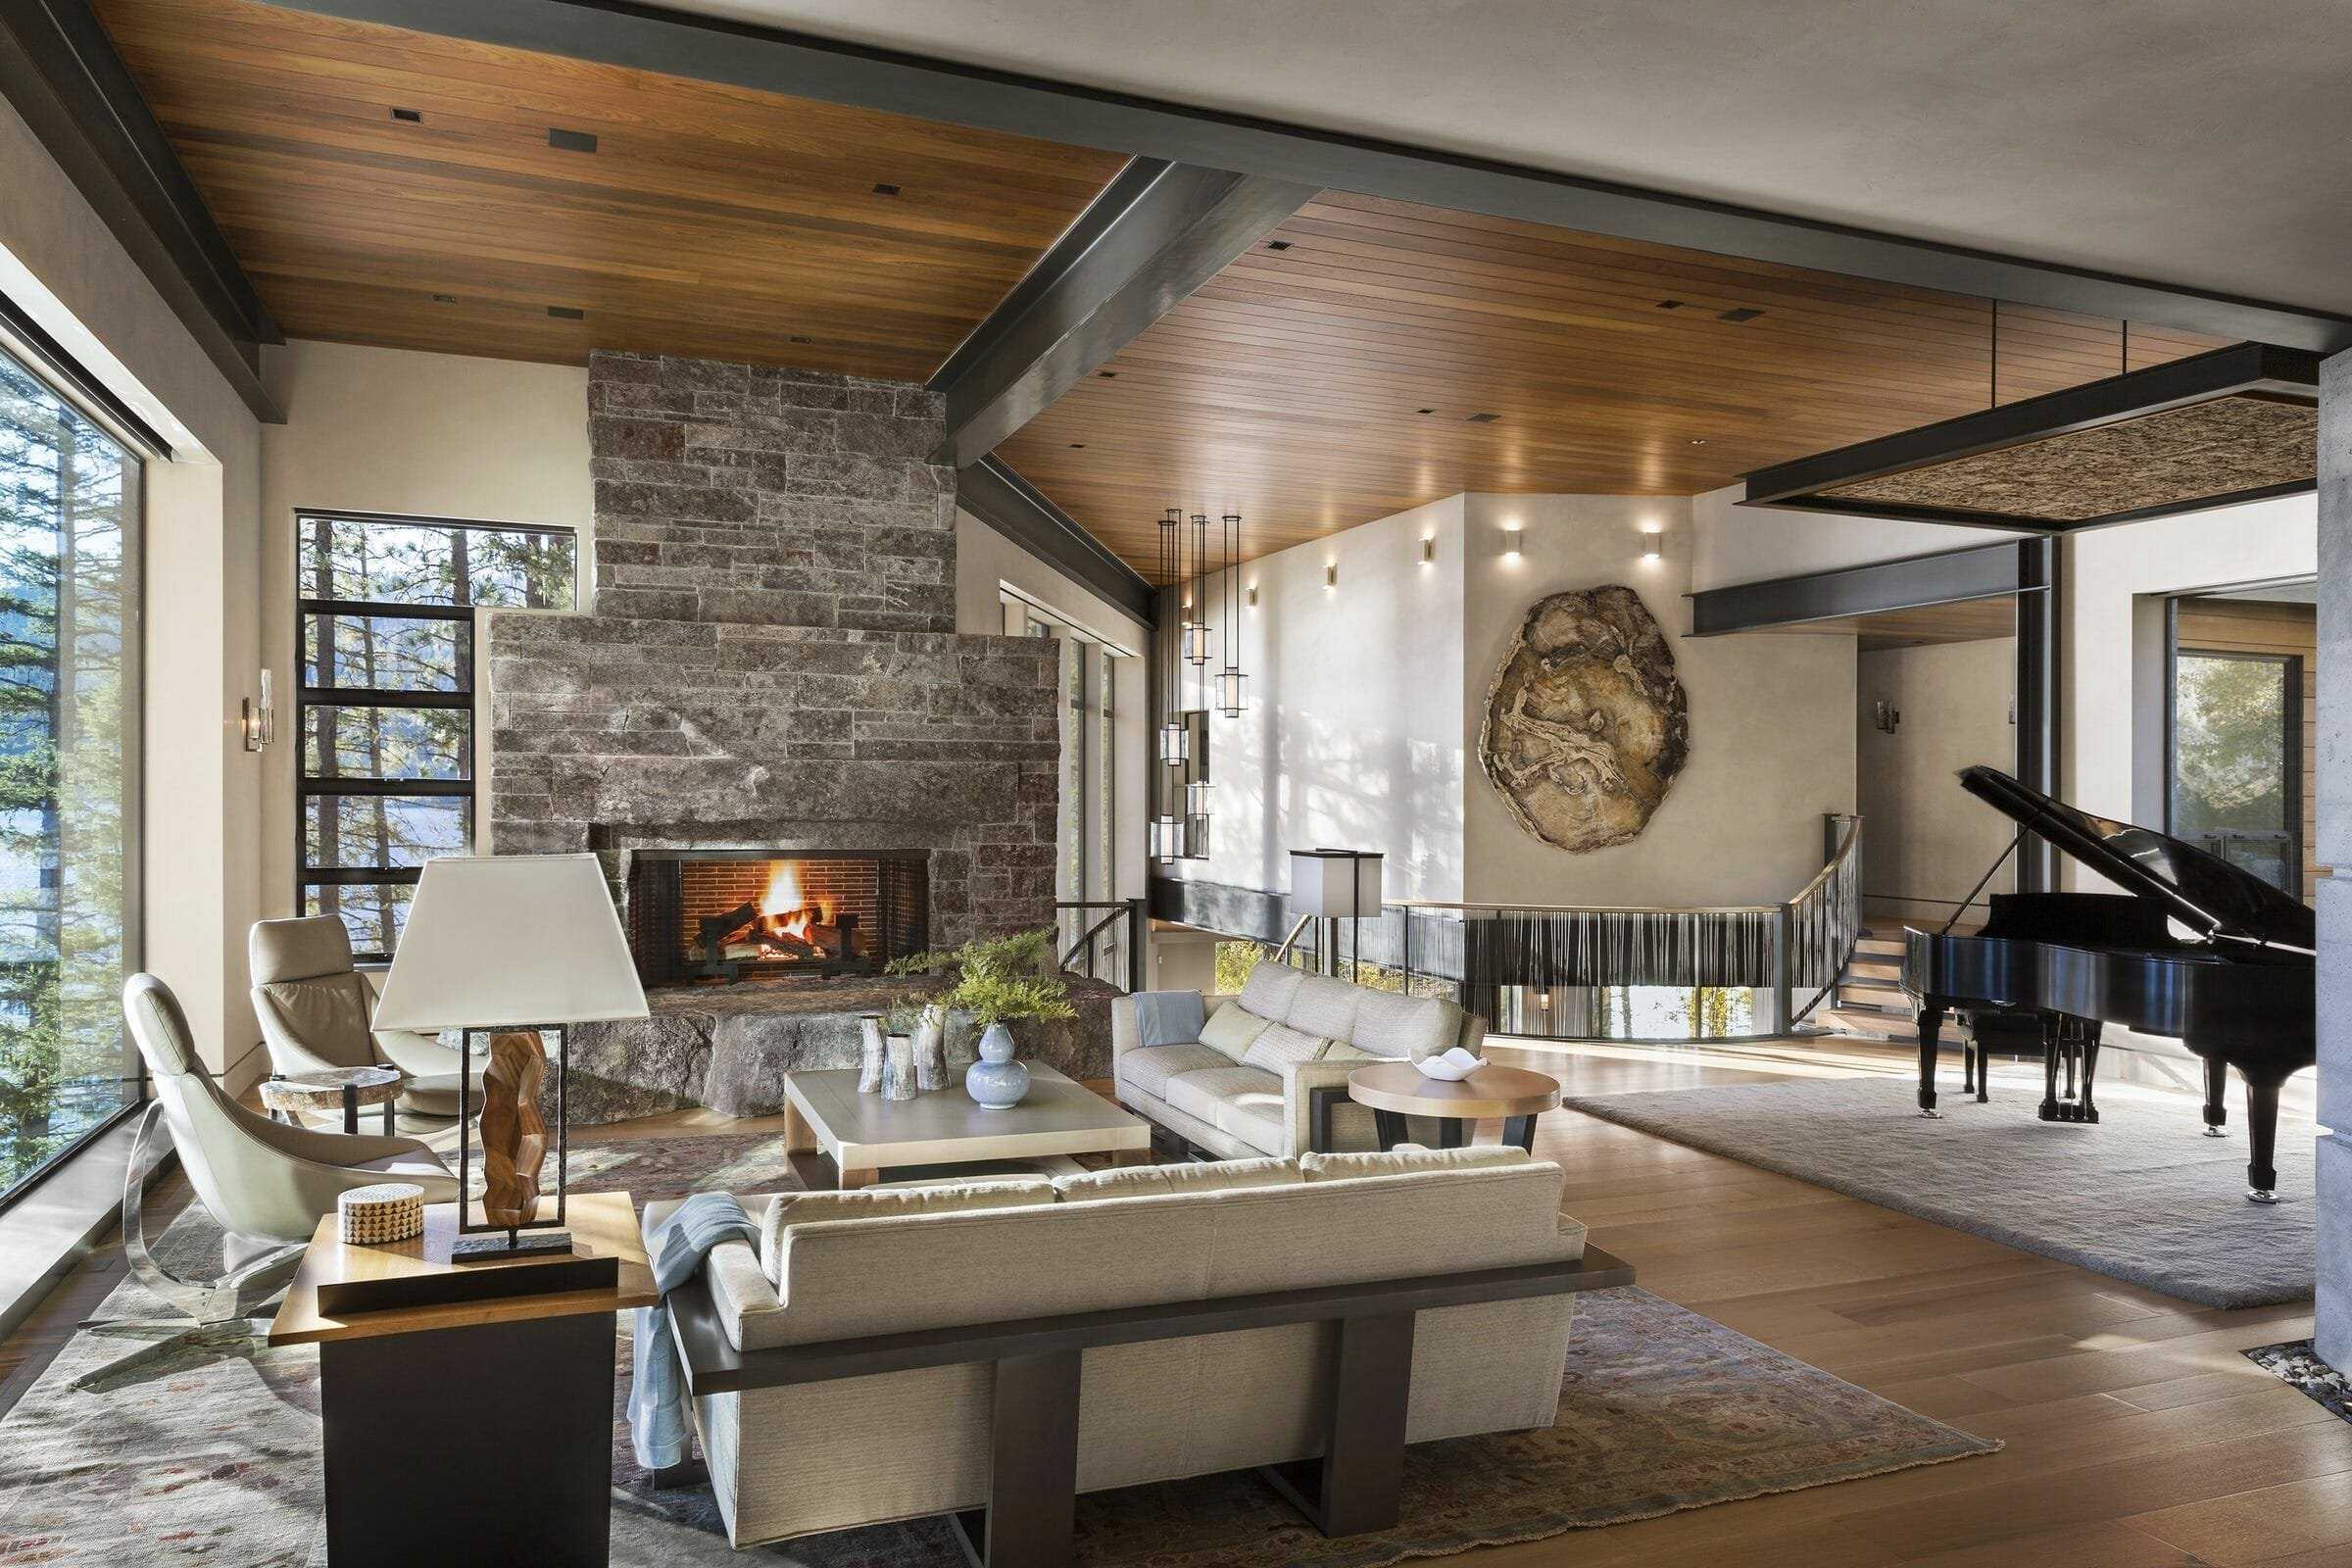 Beautiful rustic interior design for living room